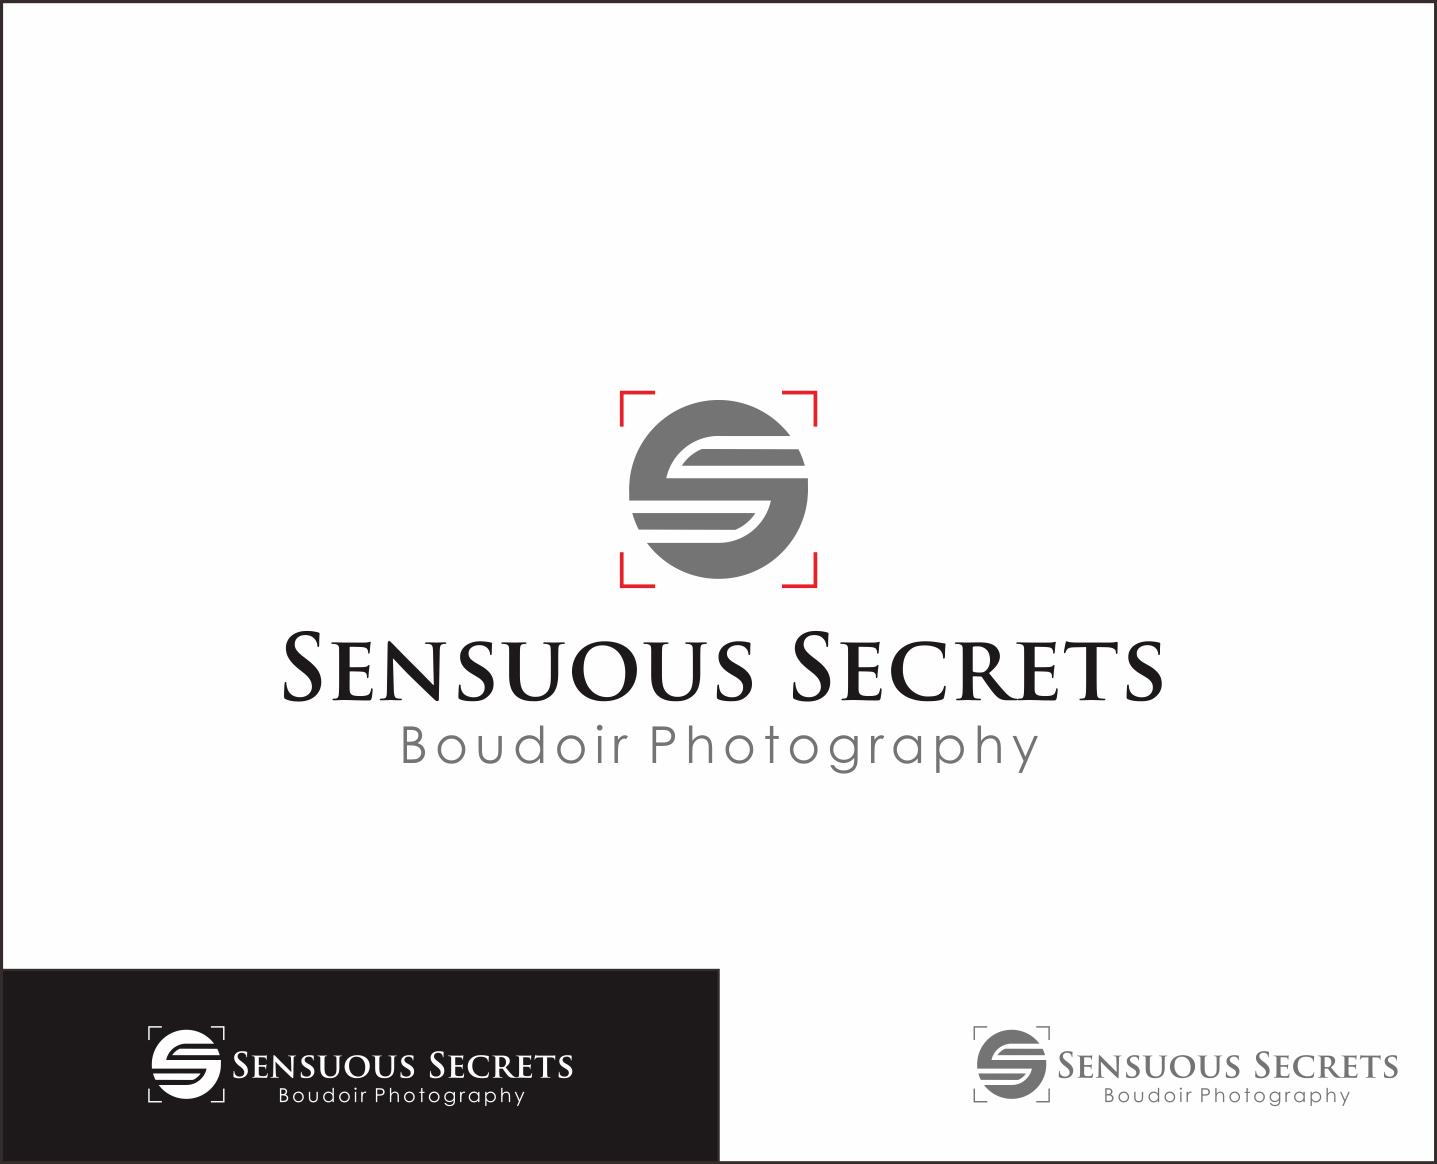 Logo Design by Armada Jamaluddin - Entry No. 118 in the Logo Design Contest Artistic Logo Design for Sensuous Secrets Boudoir Photography.